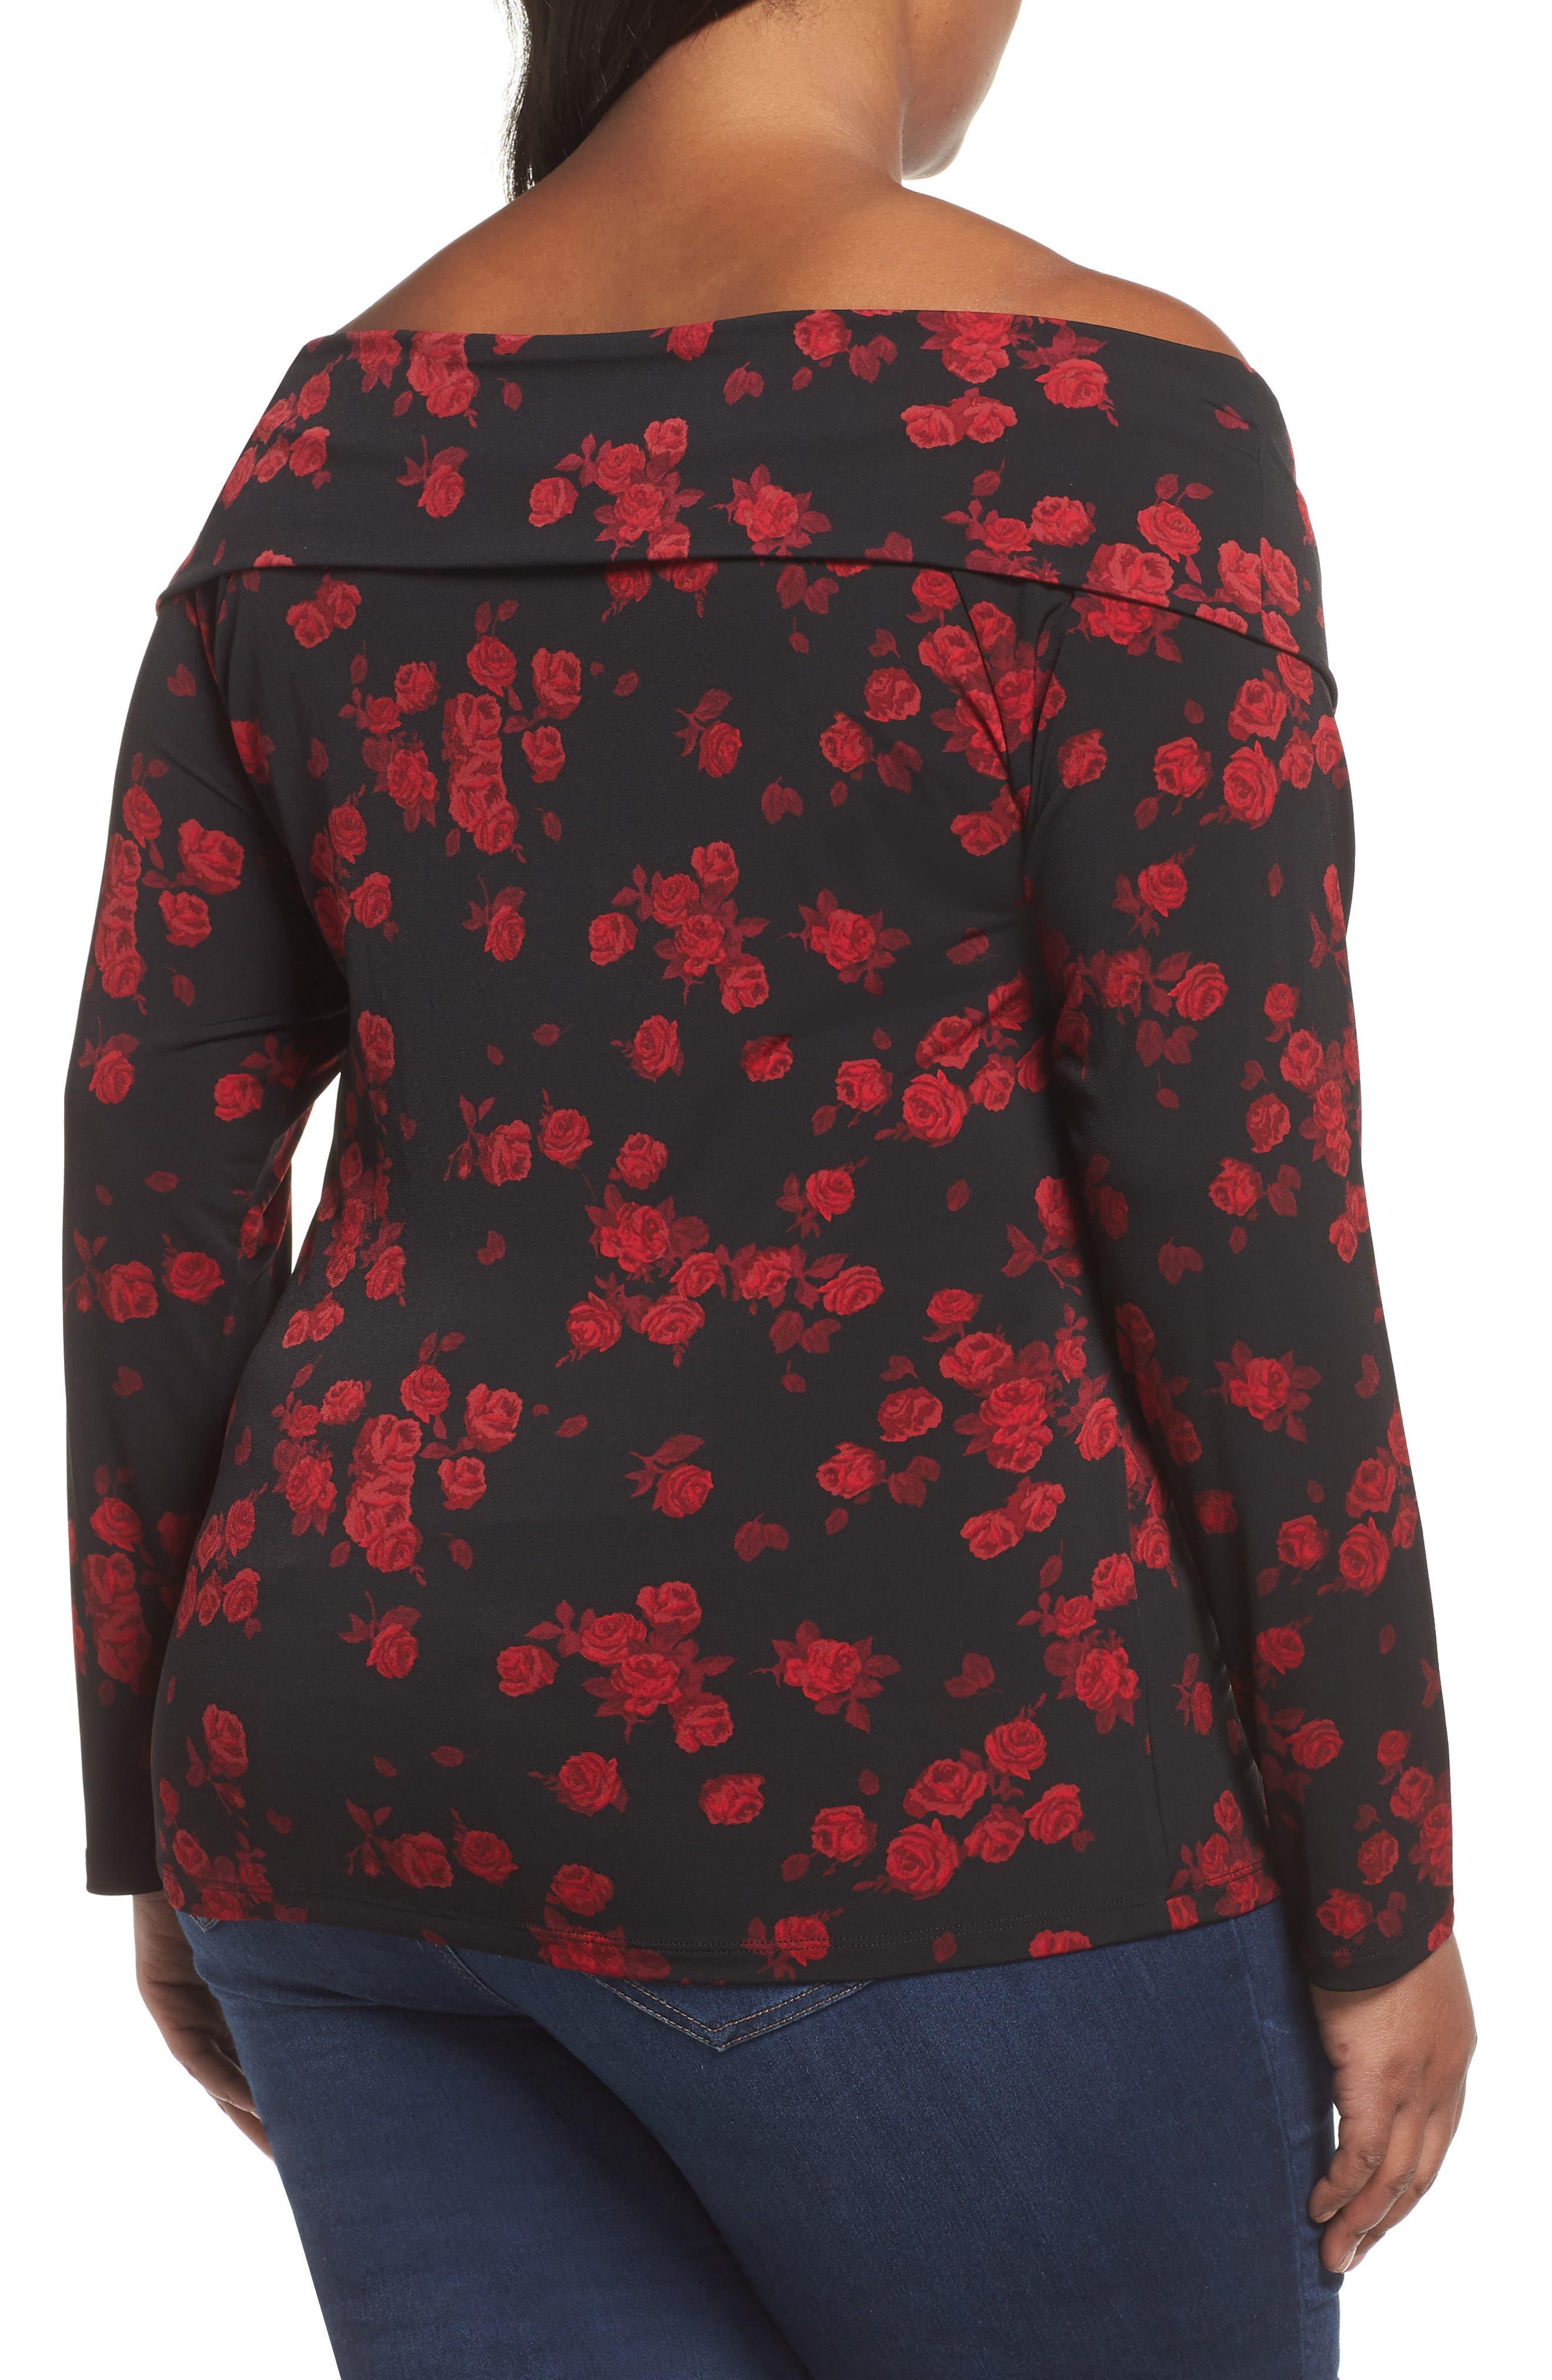 Off the Shoulder Rose Top,                             Alternate thumbnail 2, color,                             BLACK/ RED CURRANT